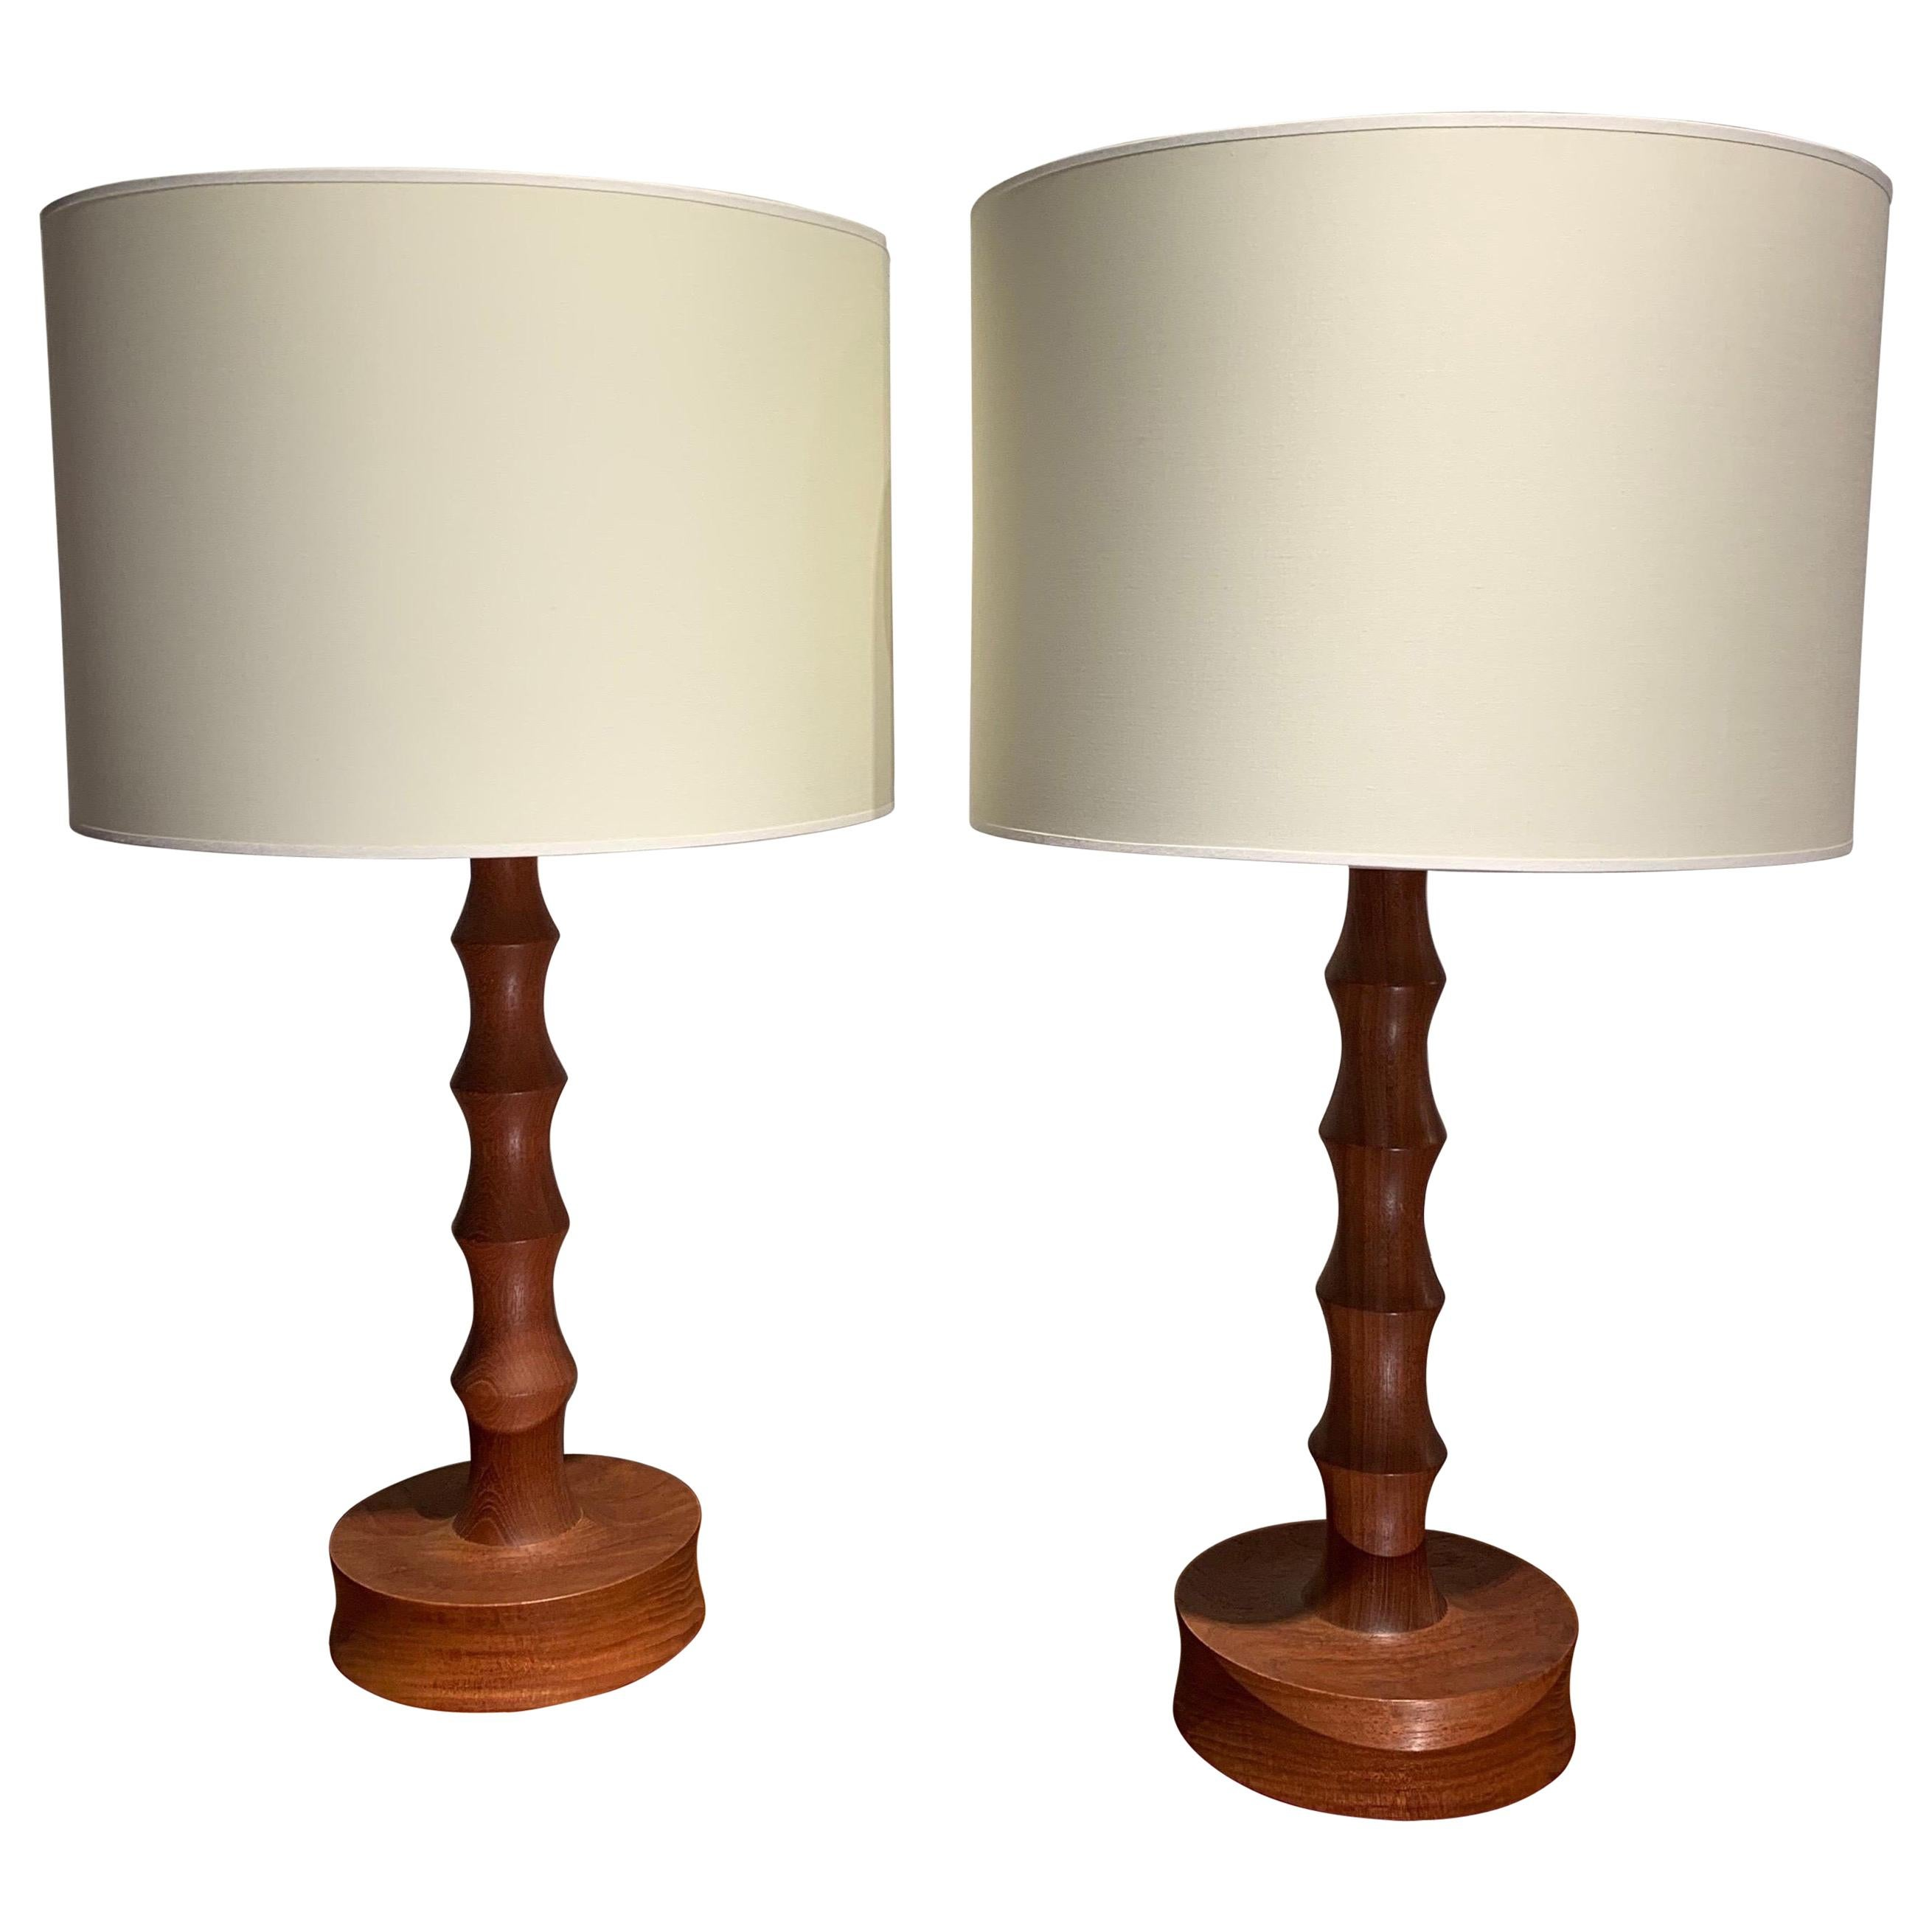 Pair of Danish Brutalist Wood Table Lamps, 1970s